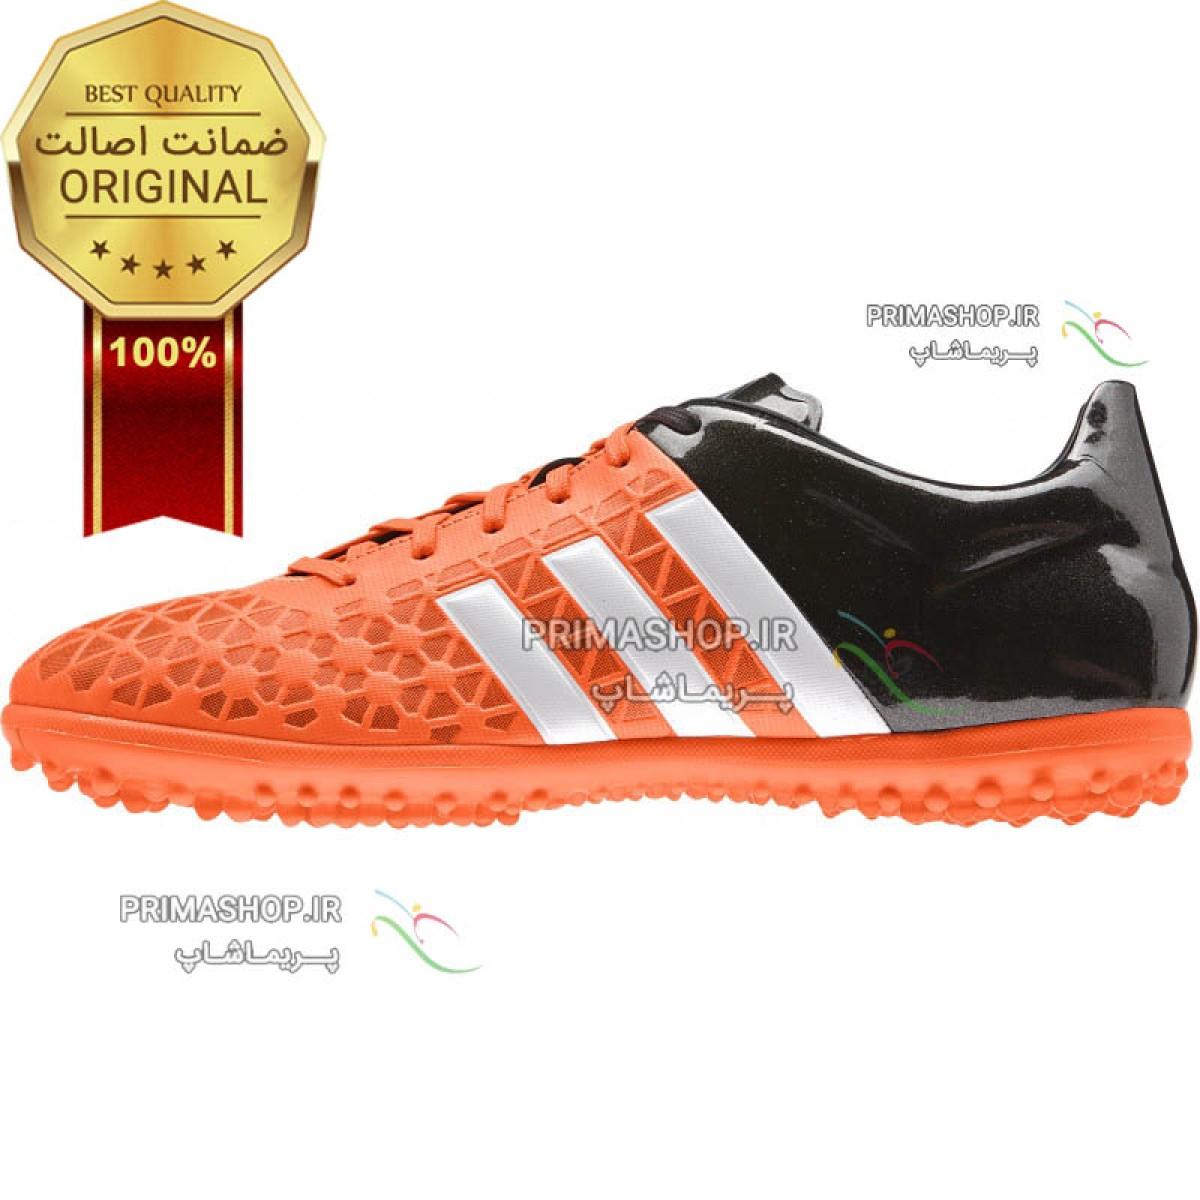 کفش اورجینال آدیداس ایس 15.3نارنجی  مشکی  چمن مصنوعی ace 15.3 tf